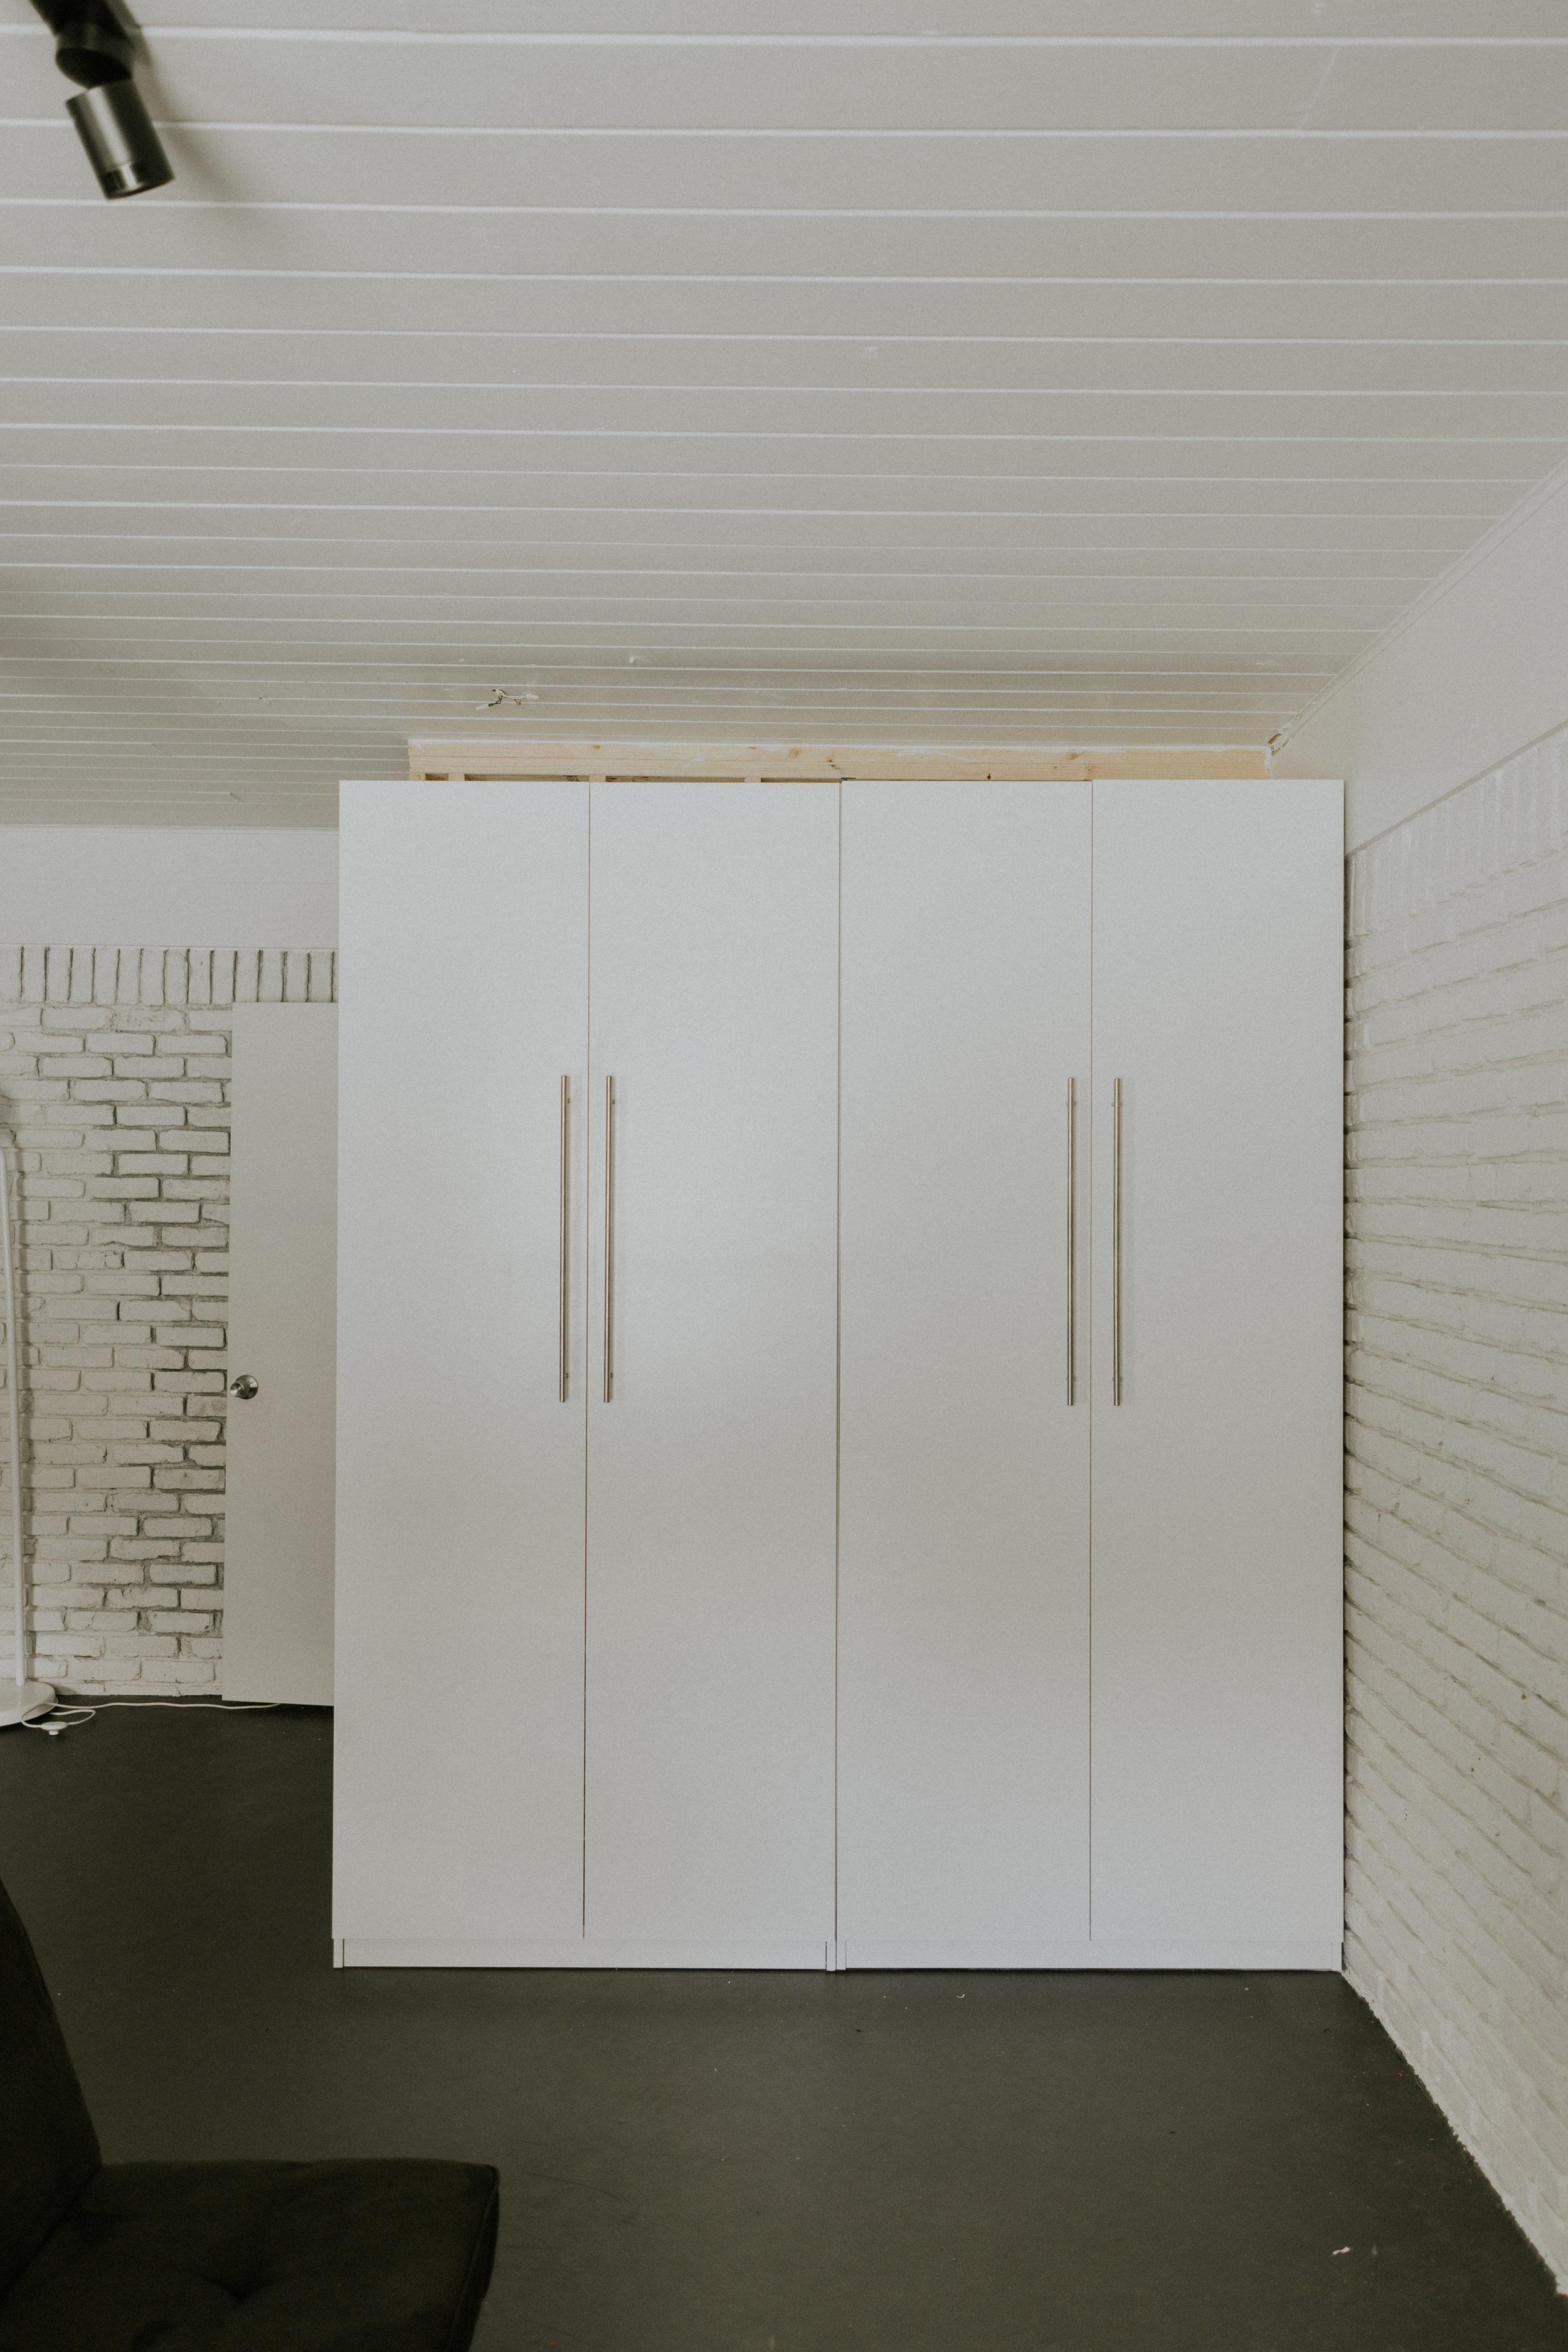 Ikea Pax Wardrobe for bedroom